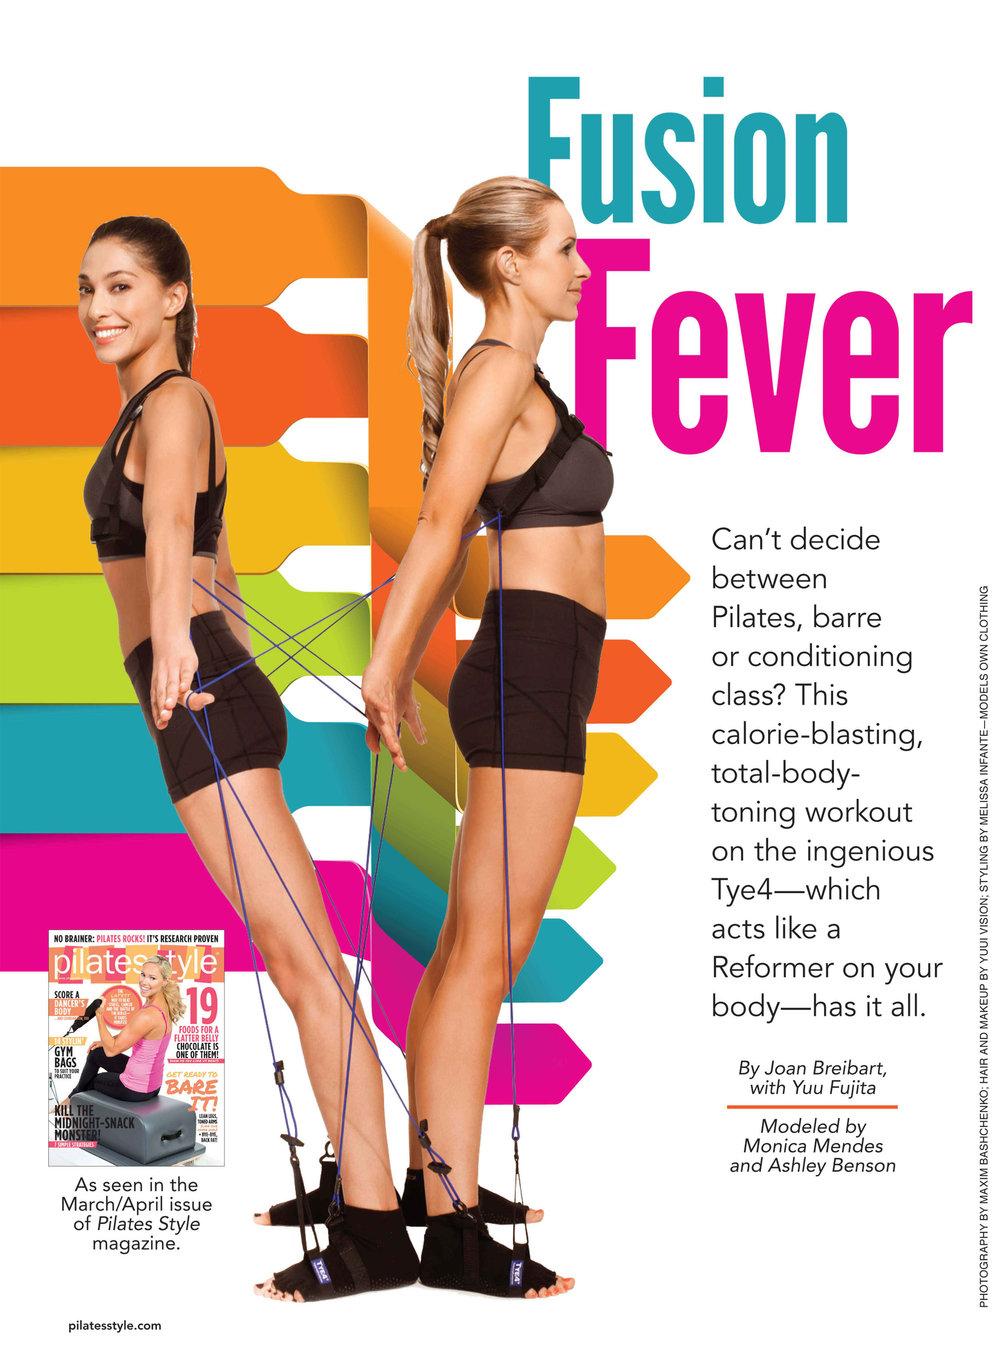 Fusion-Fever1-copy-copy-copy.jpg